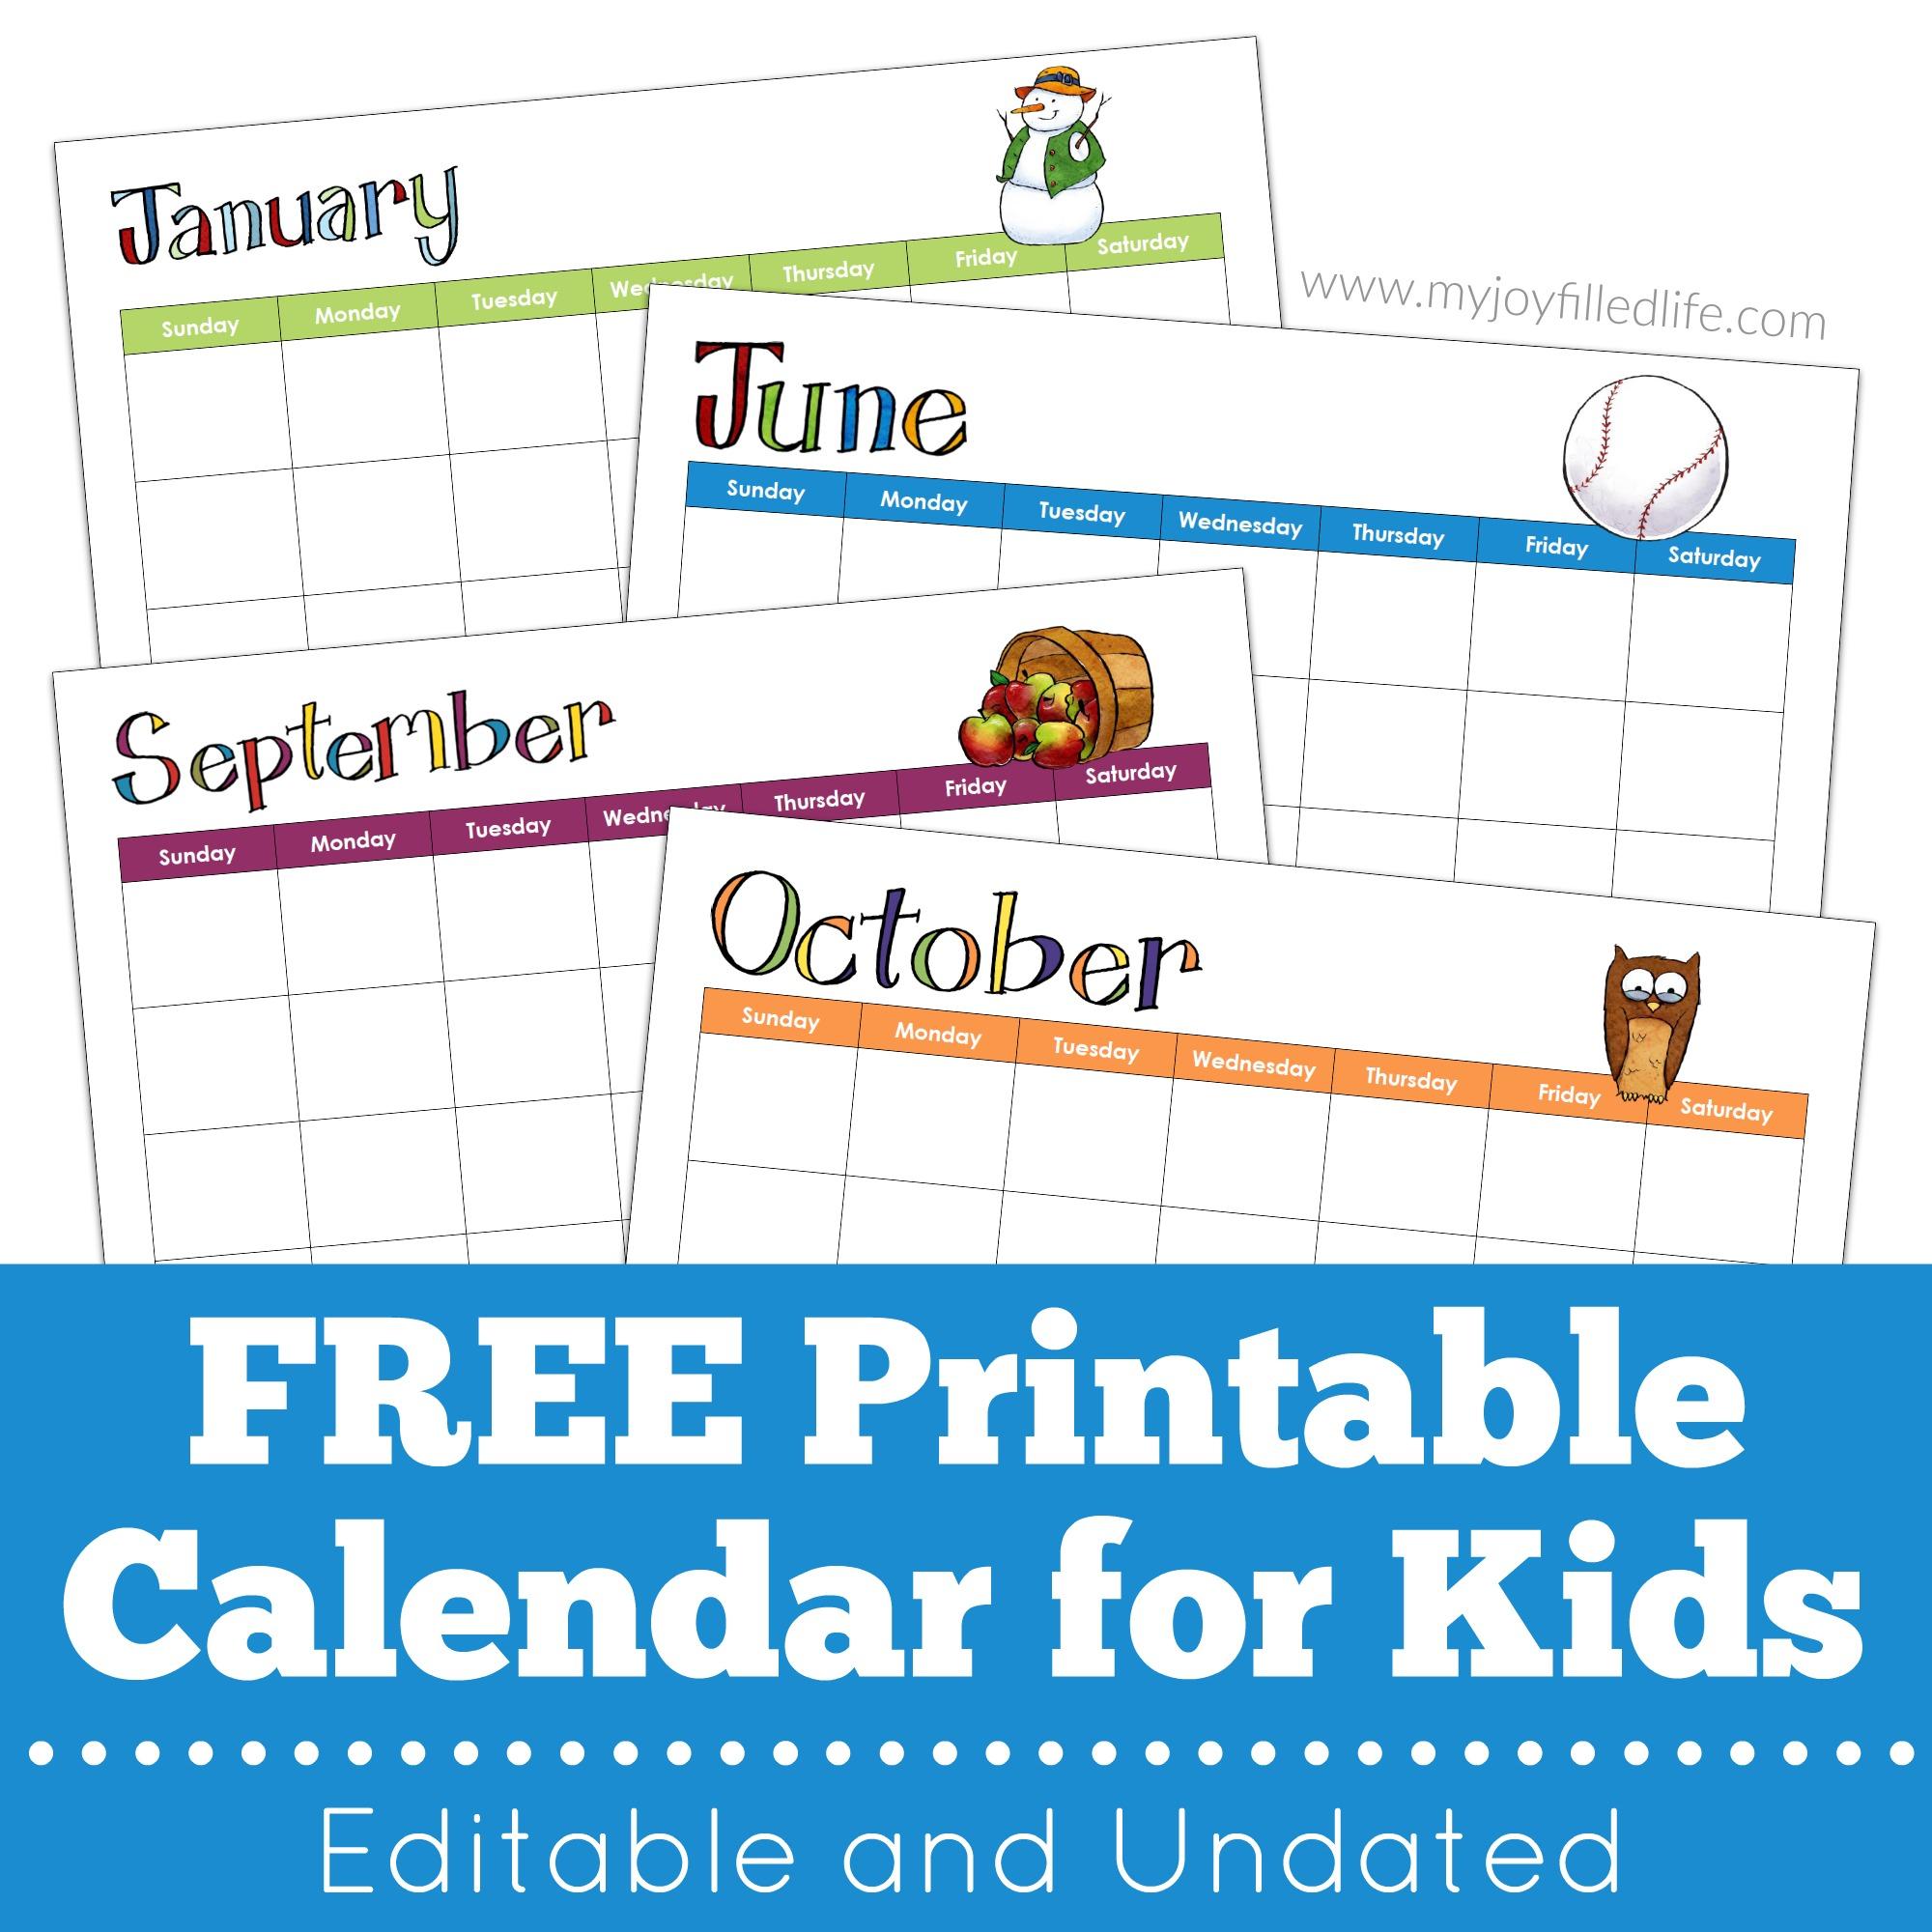 Printable Calendar - Editable & Undated